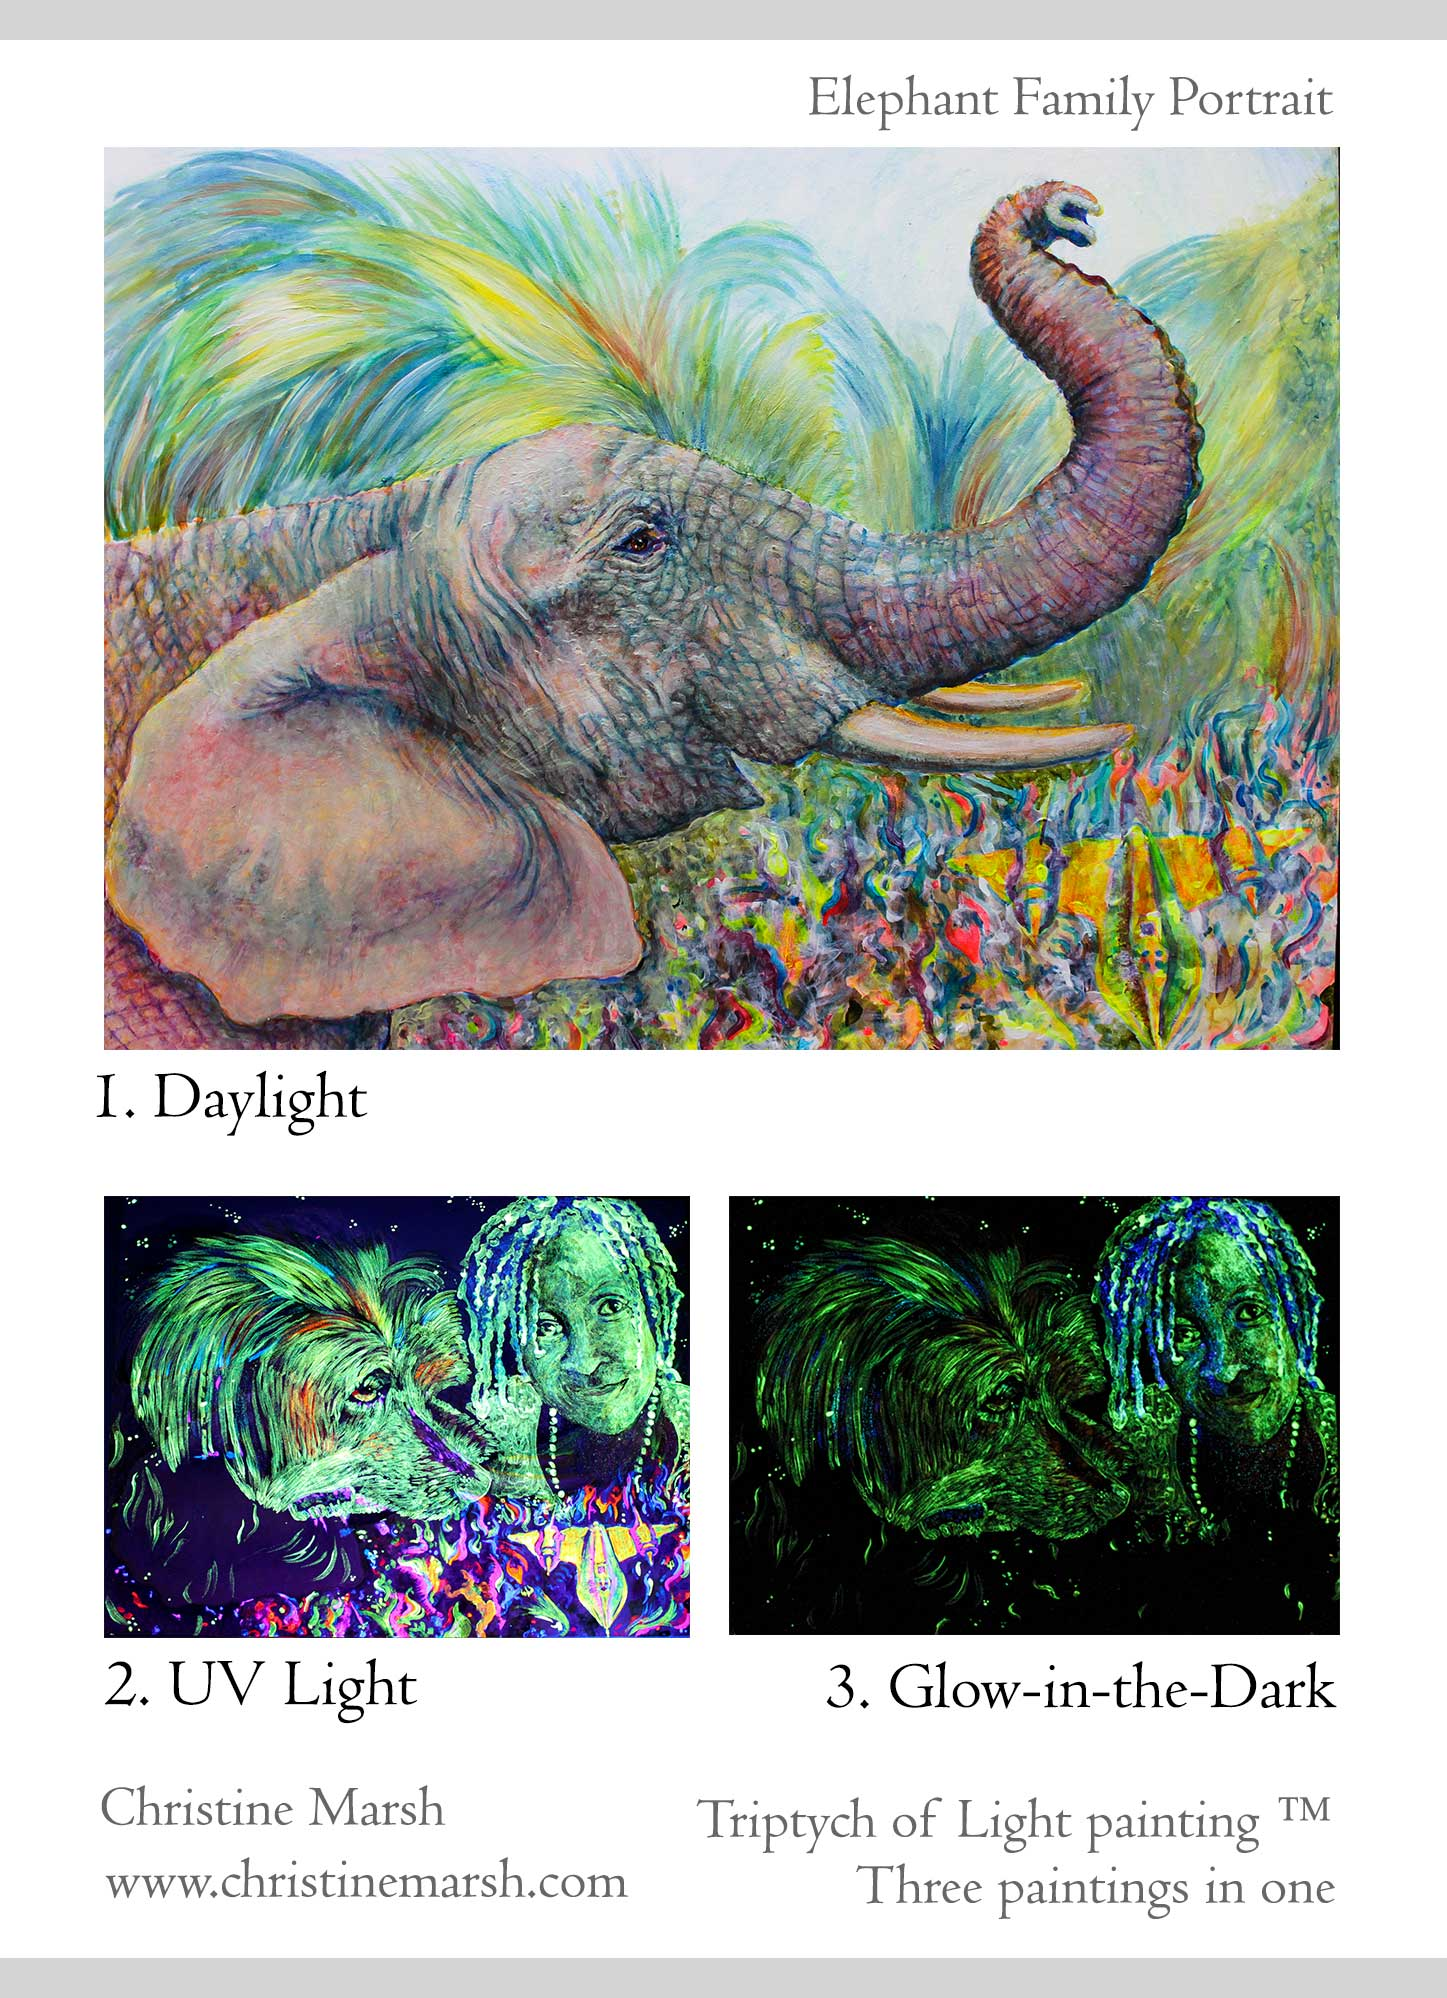 Triptych of Light - Elephant Family Portrait by Christine Marsh